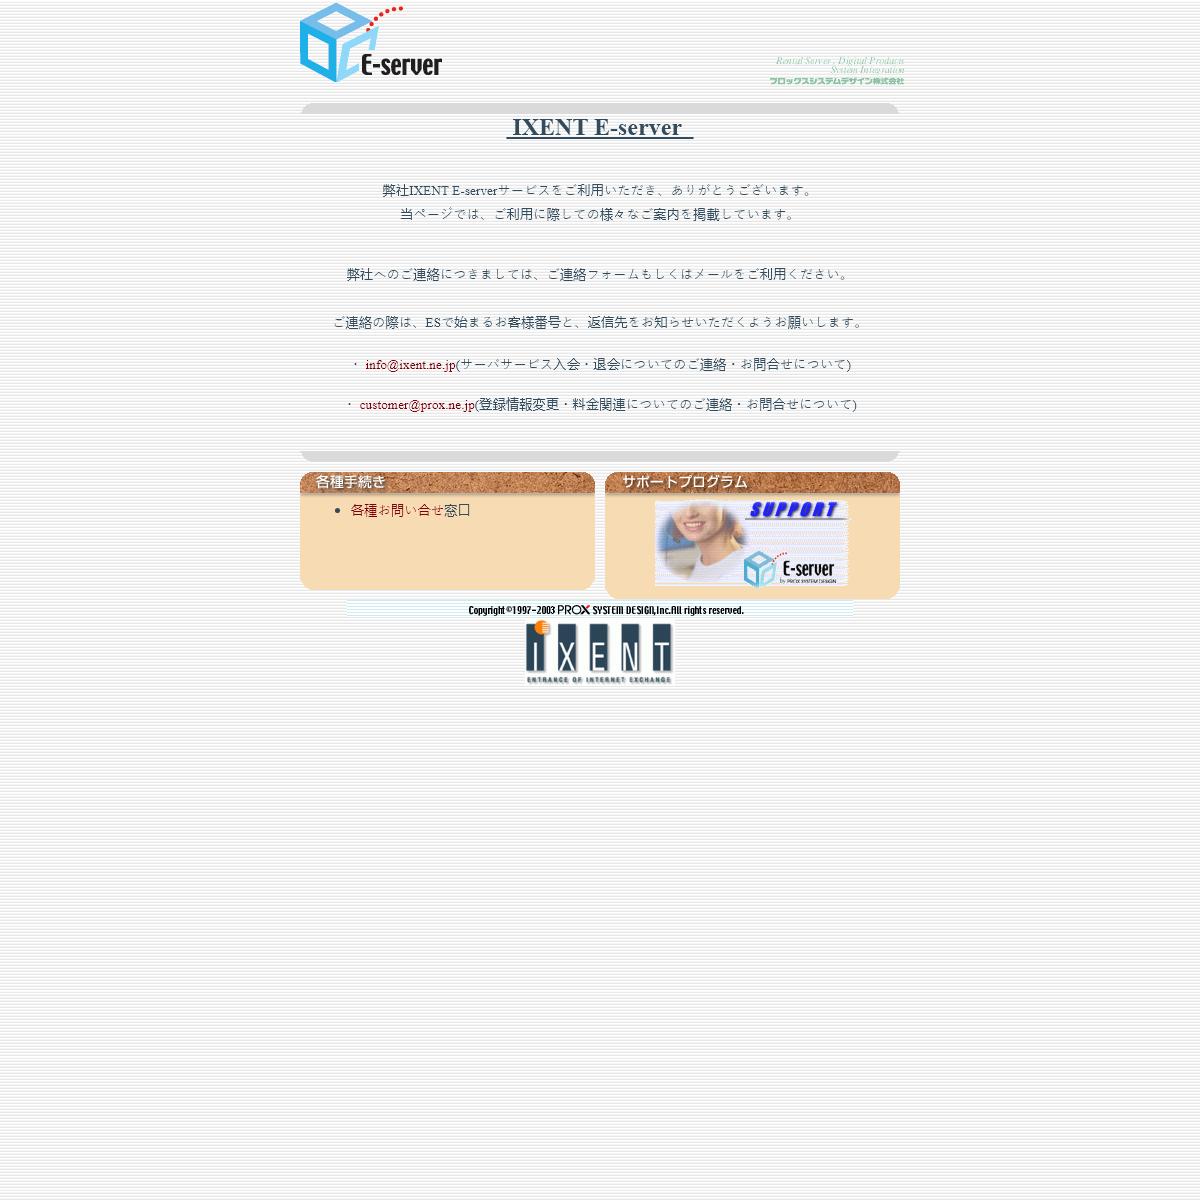 IXENT E-server